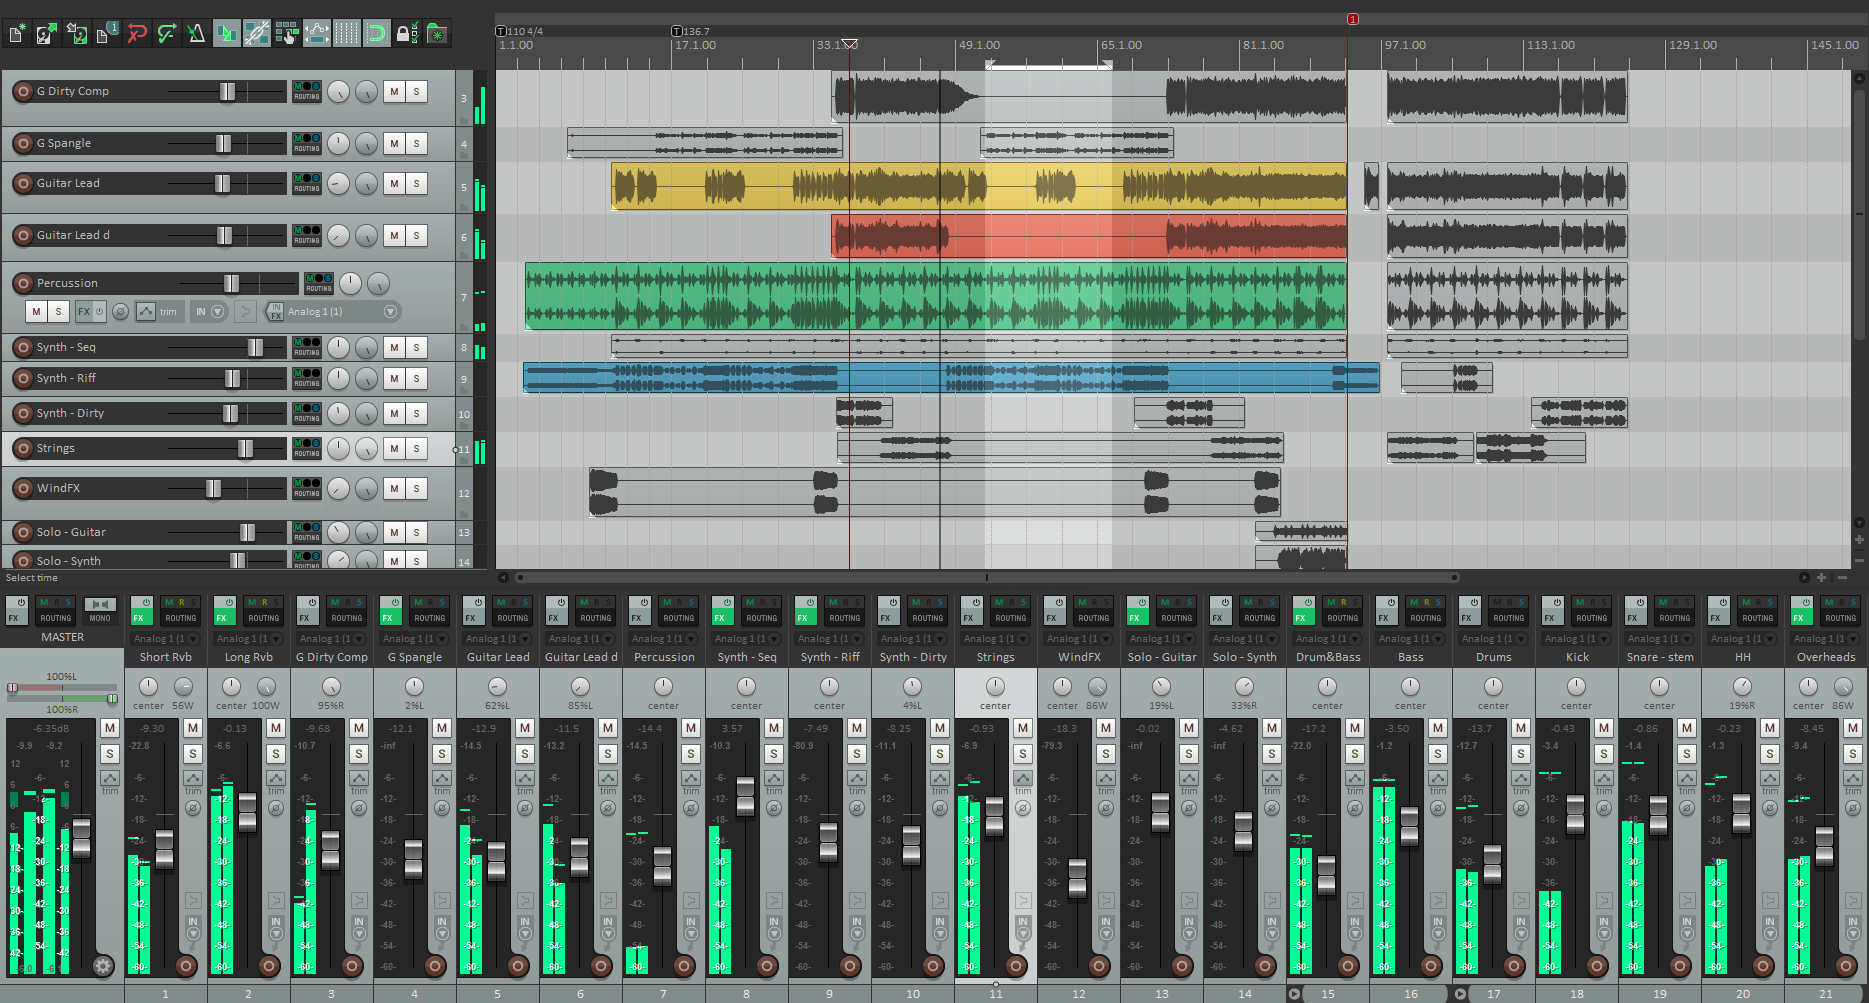 Gratis Esta Espectacular Mesa De Mezclas Profesional Audio Digital App Para Hacer Musica Programa Para Grabar Musica